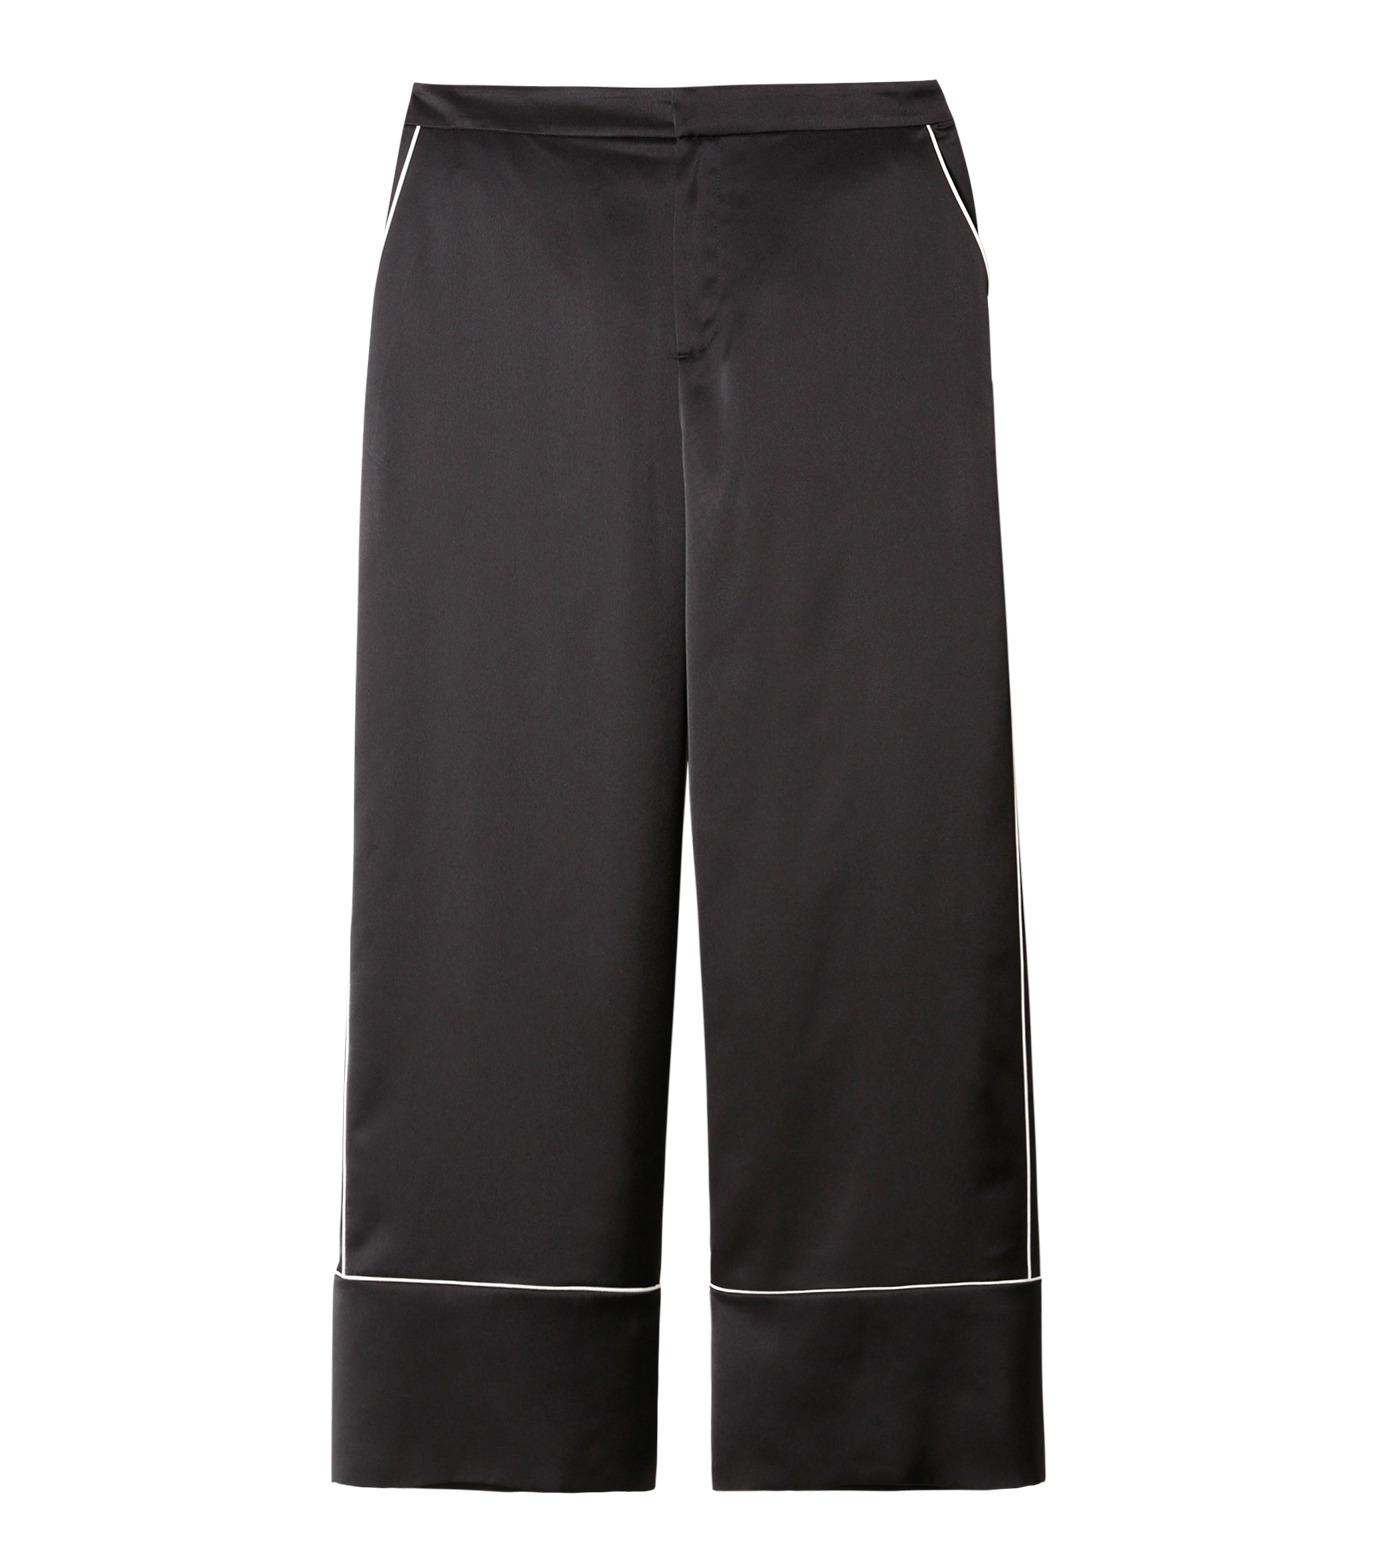 LE CIEL BLEU(ルシェルブルー)のパジャマルックパンツ-BLACK(パンツ/pants)-19S68101 拡大詳細画像1